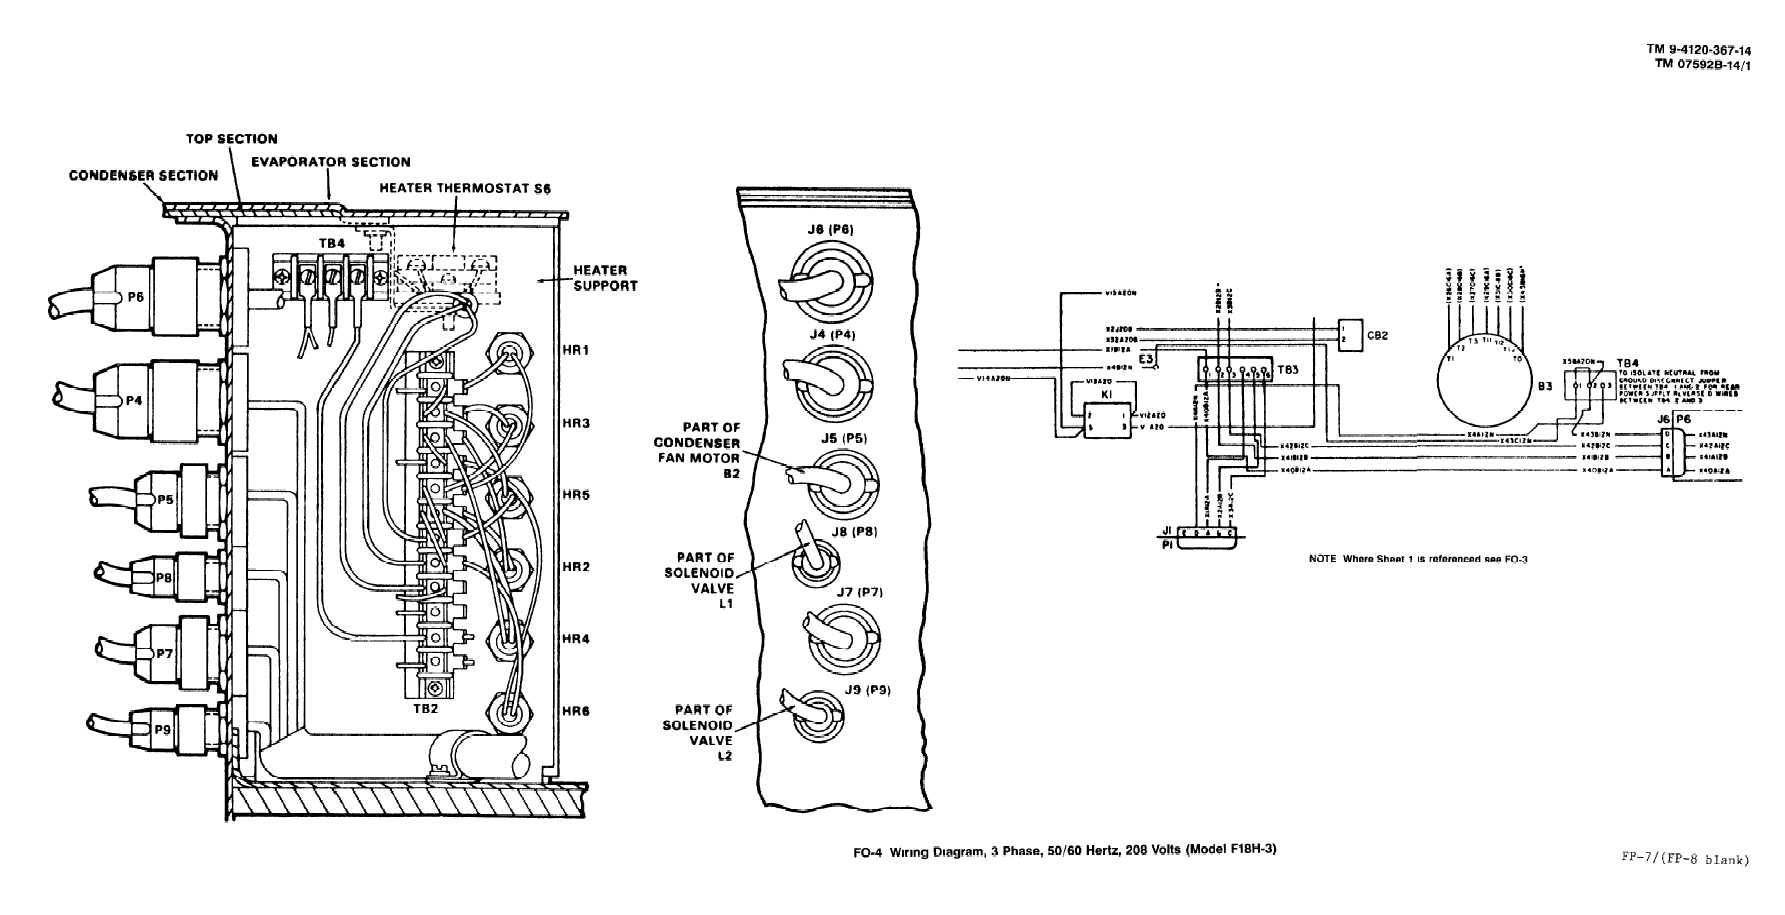 Fo 4 A Hrefhttp Electriciantrainingtpubcom 14176 Css Wiring 3 Phase Basics Diagram 107htmwiring 50 60 Hertz 208 Volts Model F18h